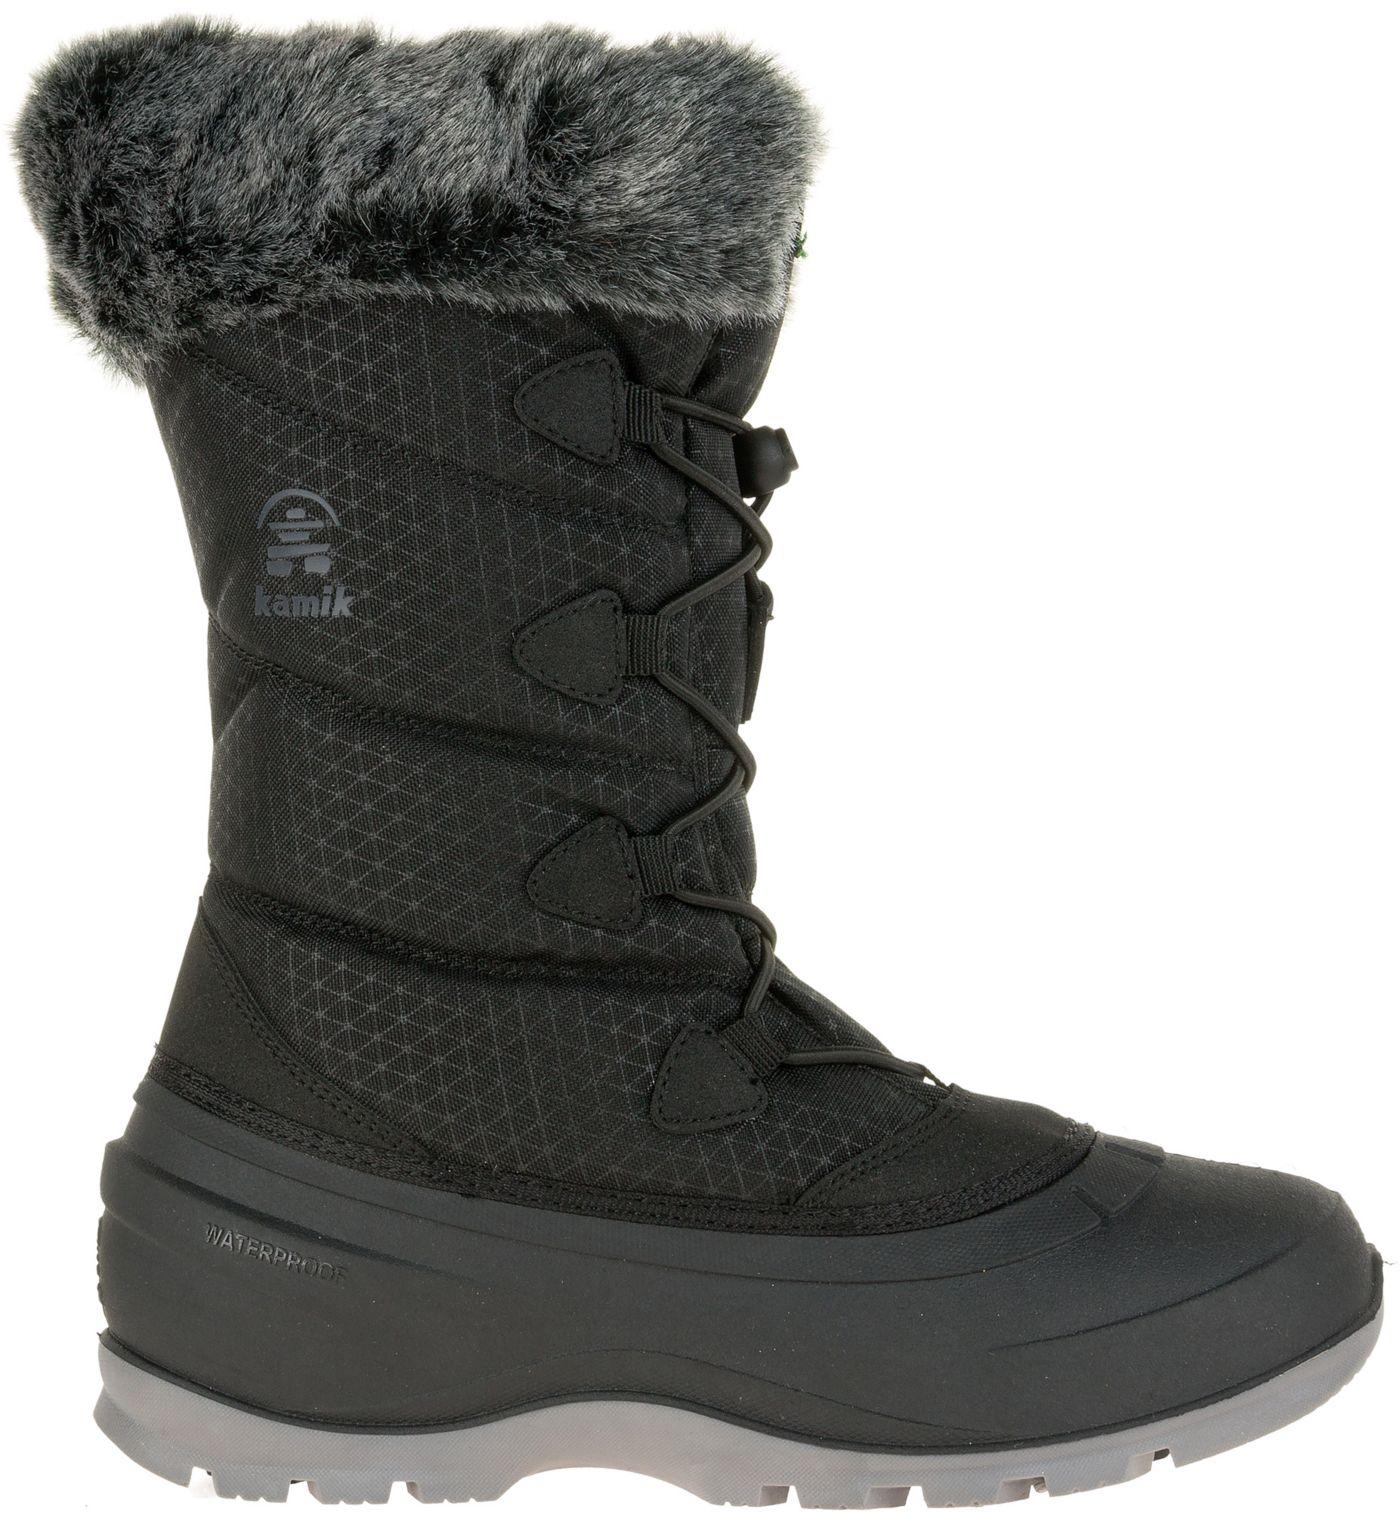 Kamik Women's Momentum2 200g Waterproof Winter Boots